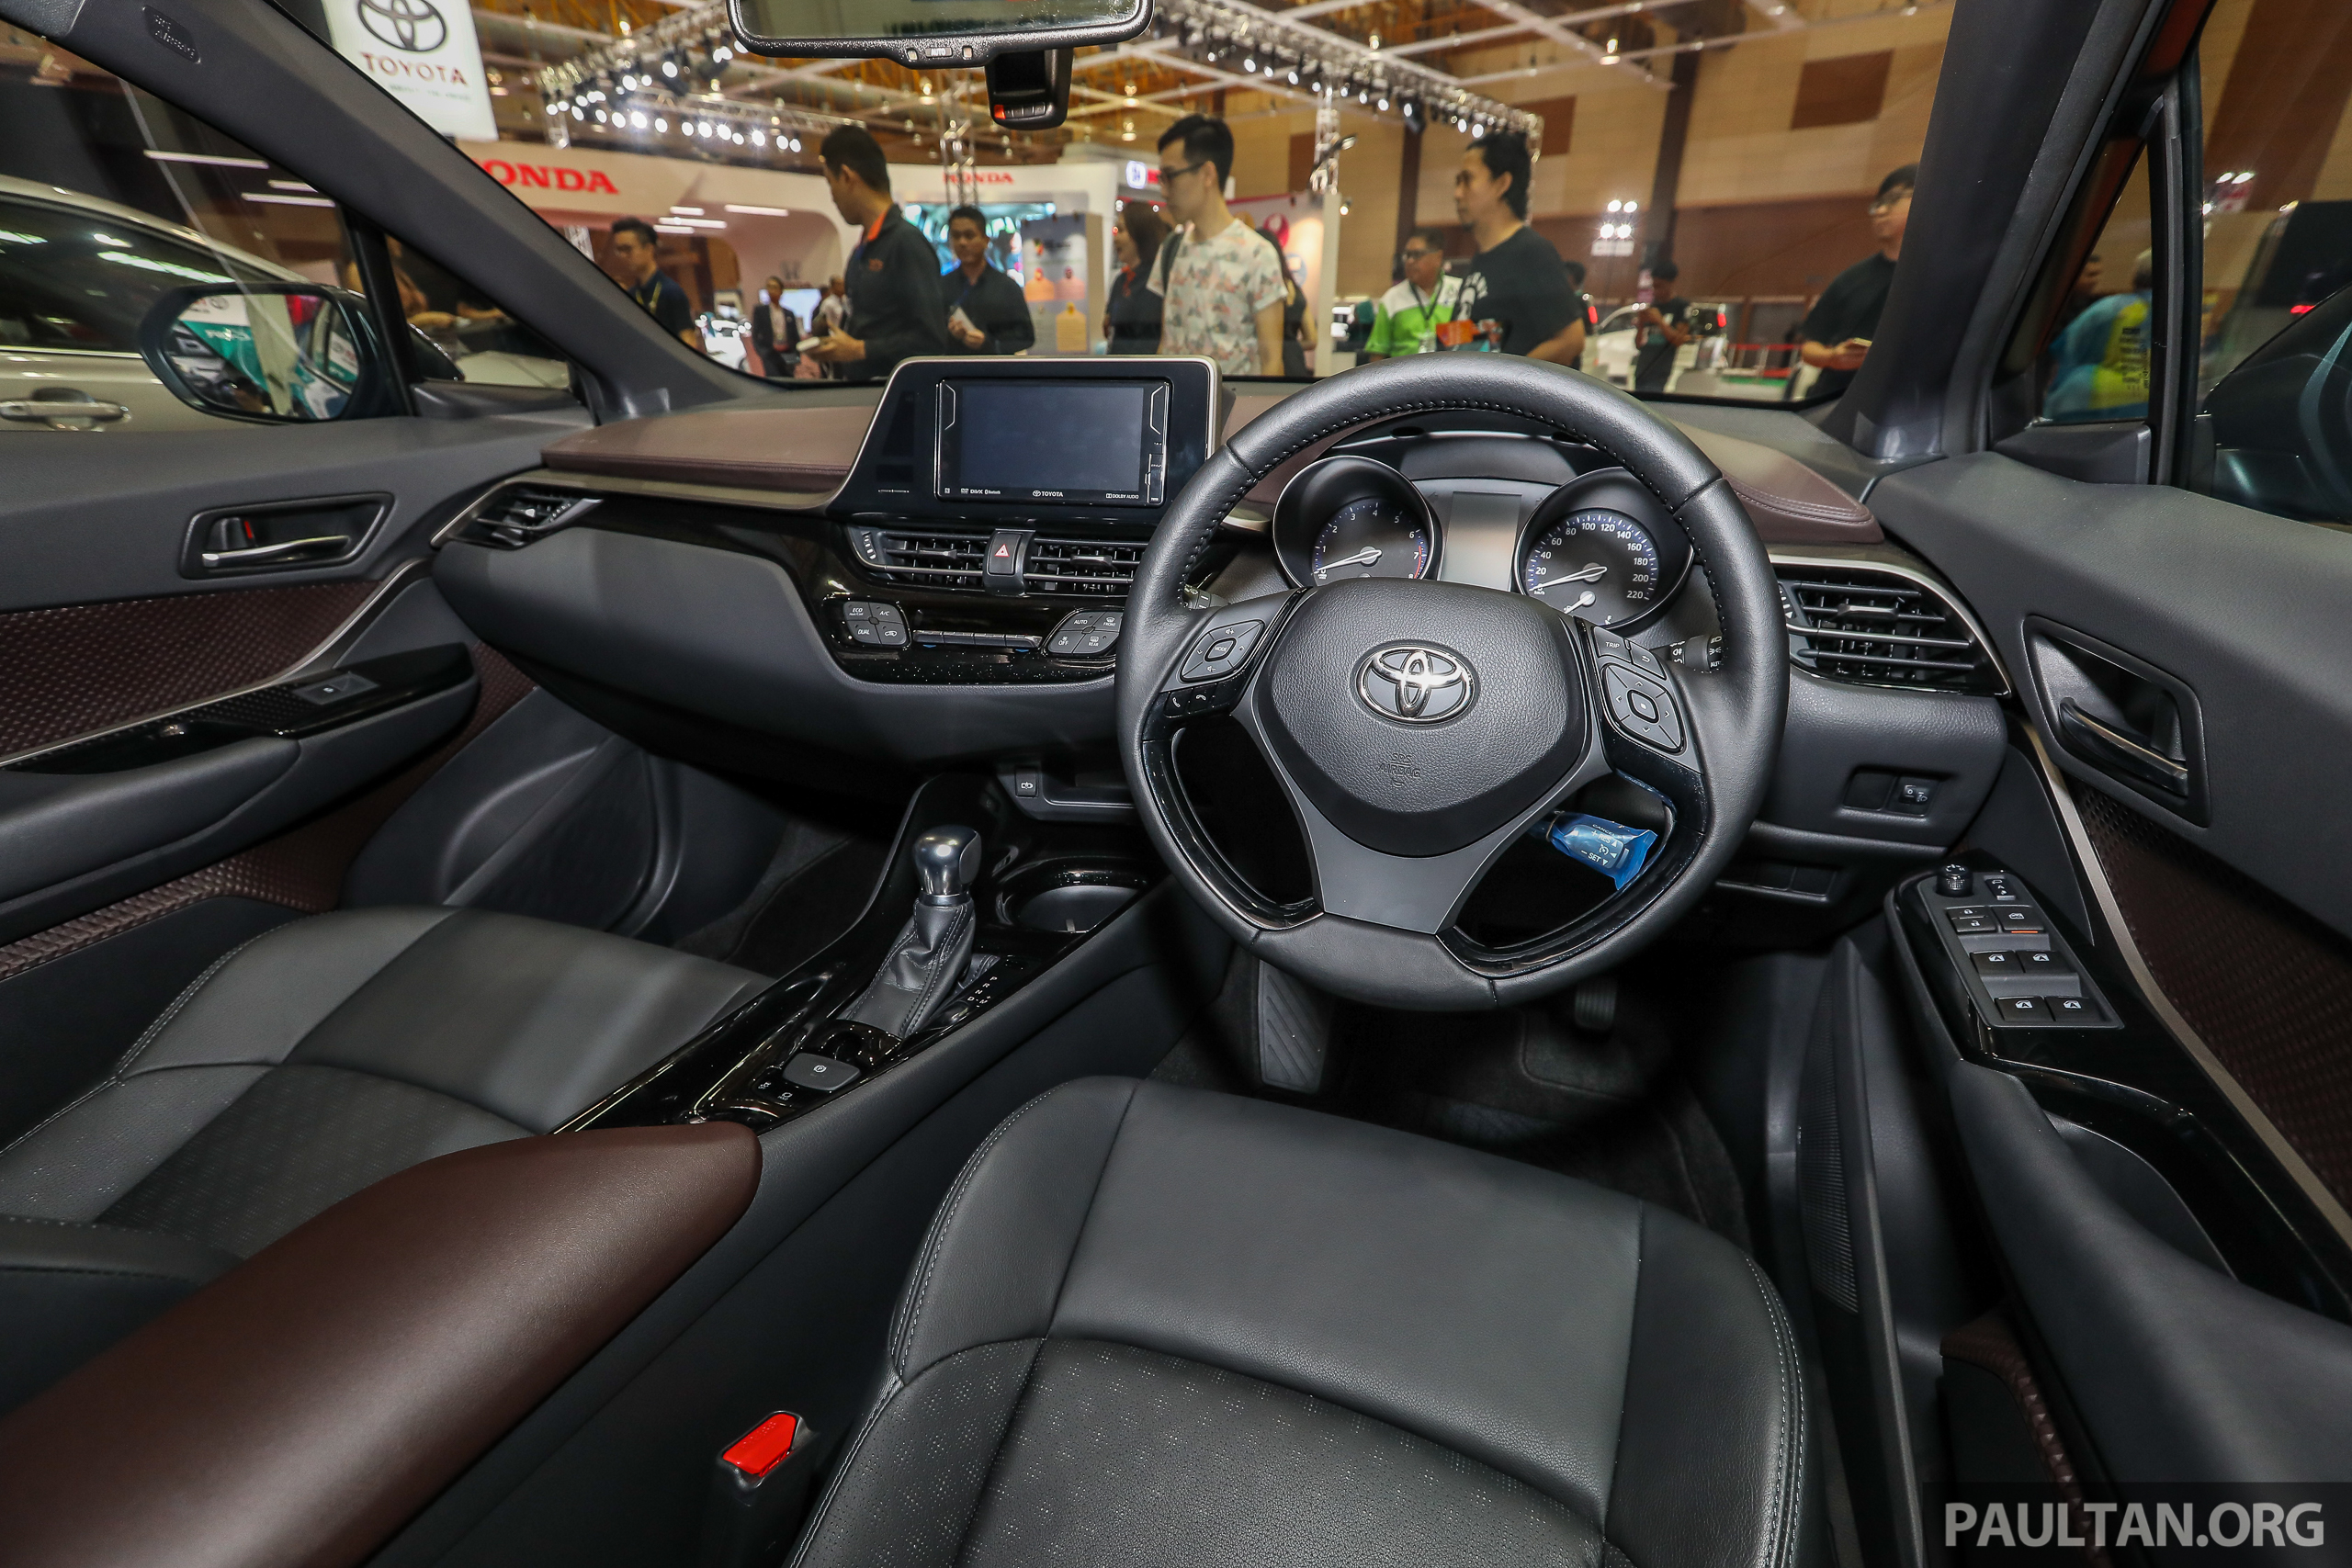 Chr Toyota Price Malaysia >> Toyota C-HR 本地版本展出,规格正式确认,明年上市。 Toyota C-HR 2018_Int-14 - Paul Tan 汽车资讯网